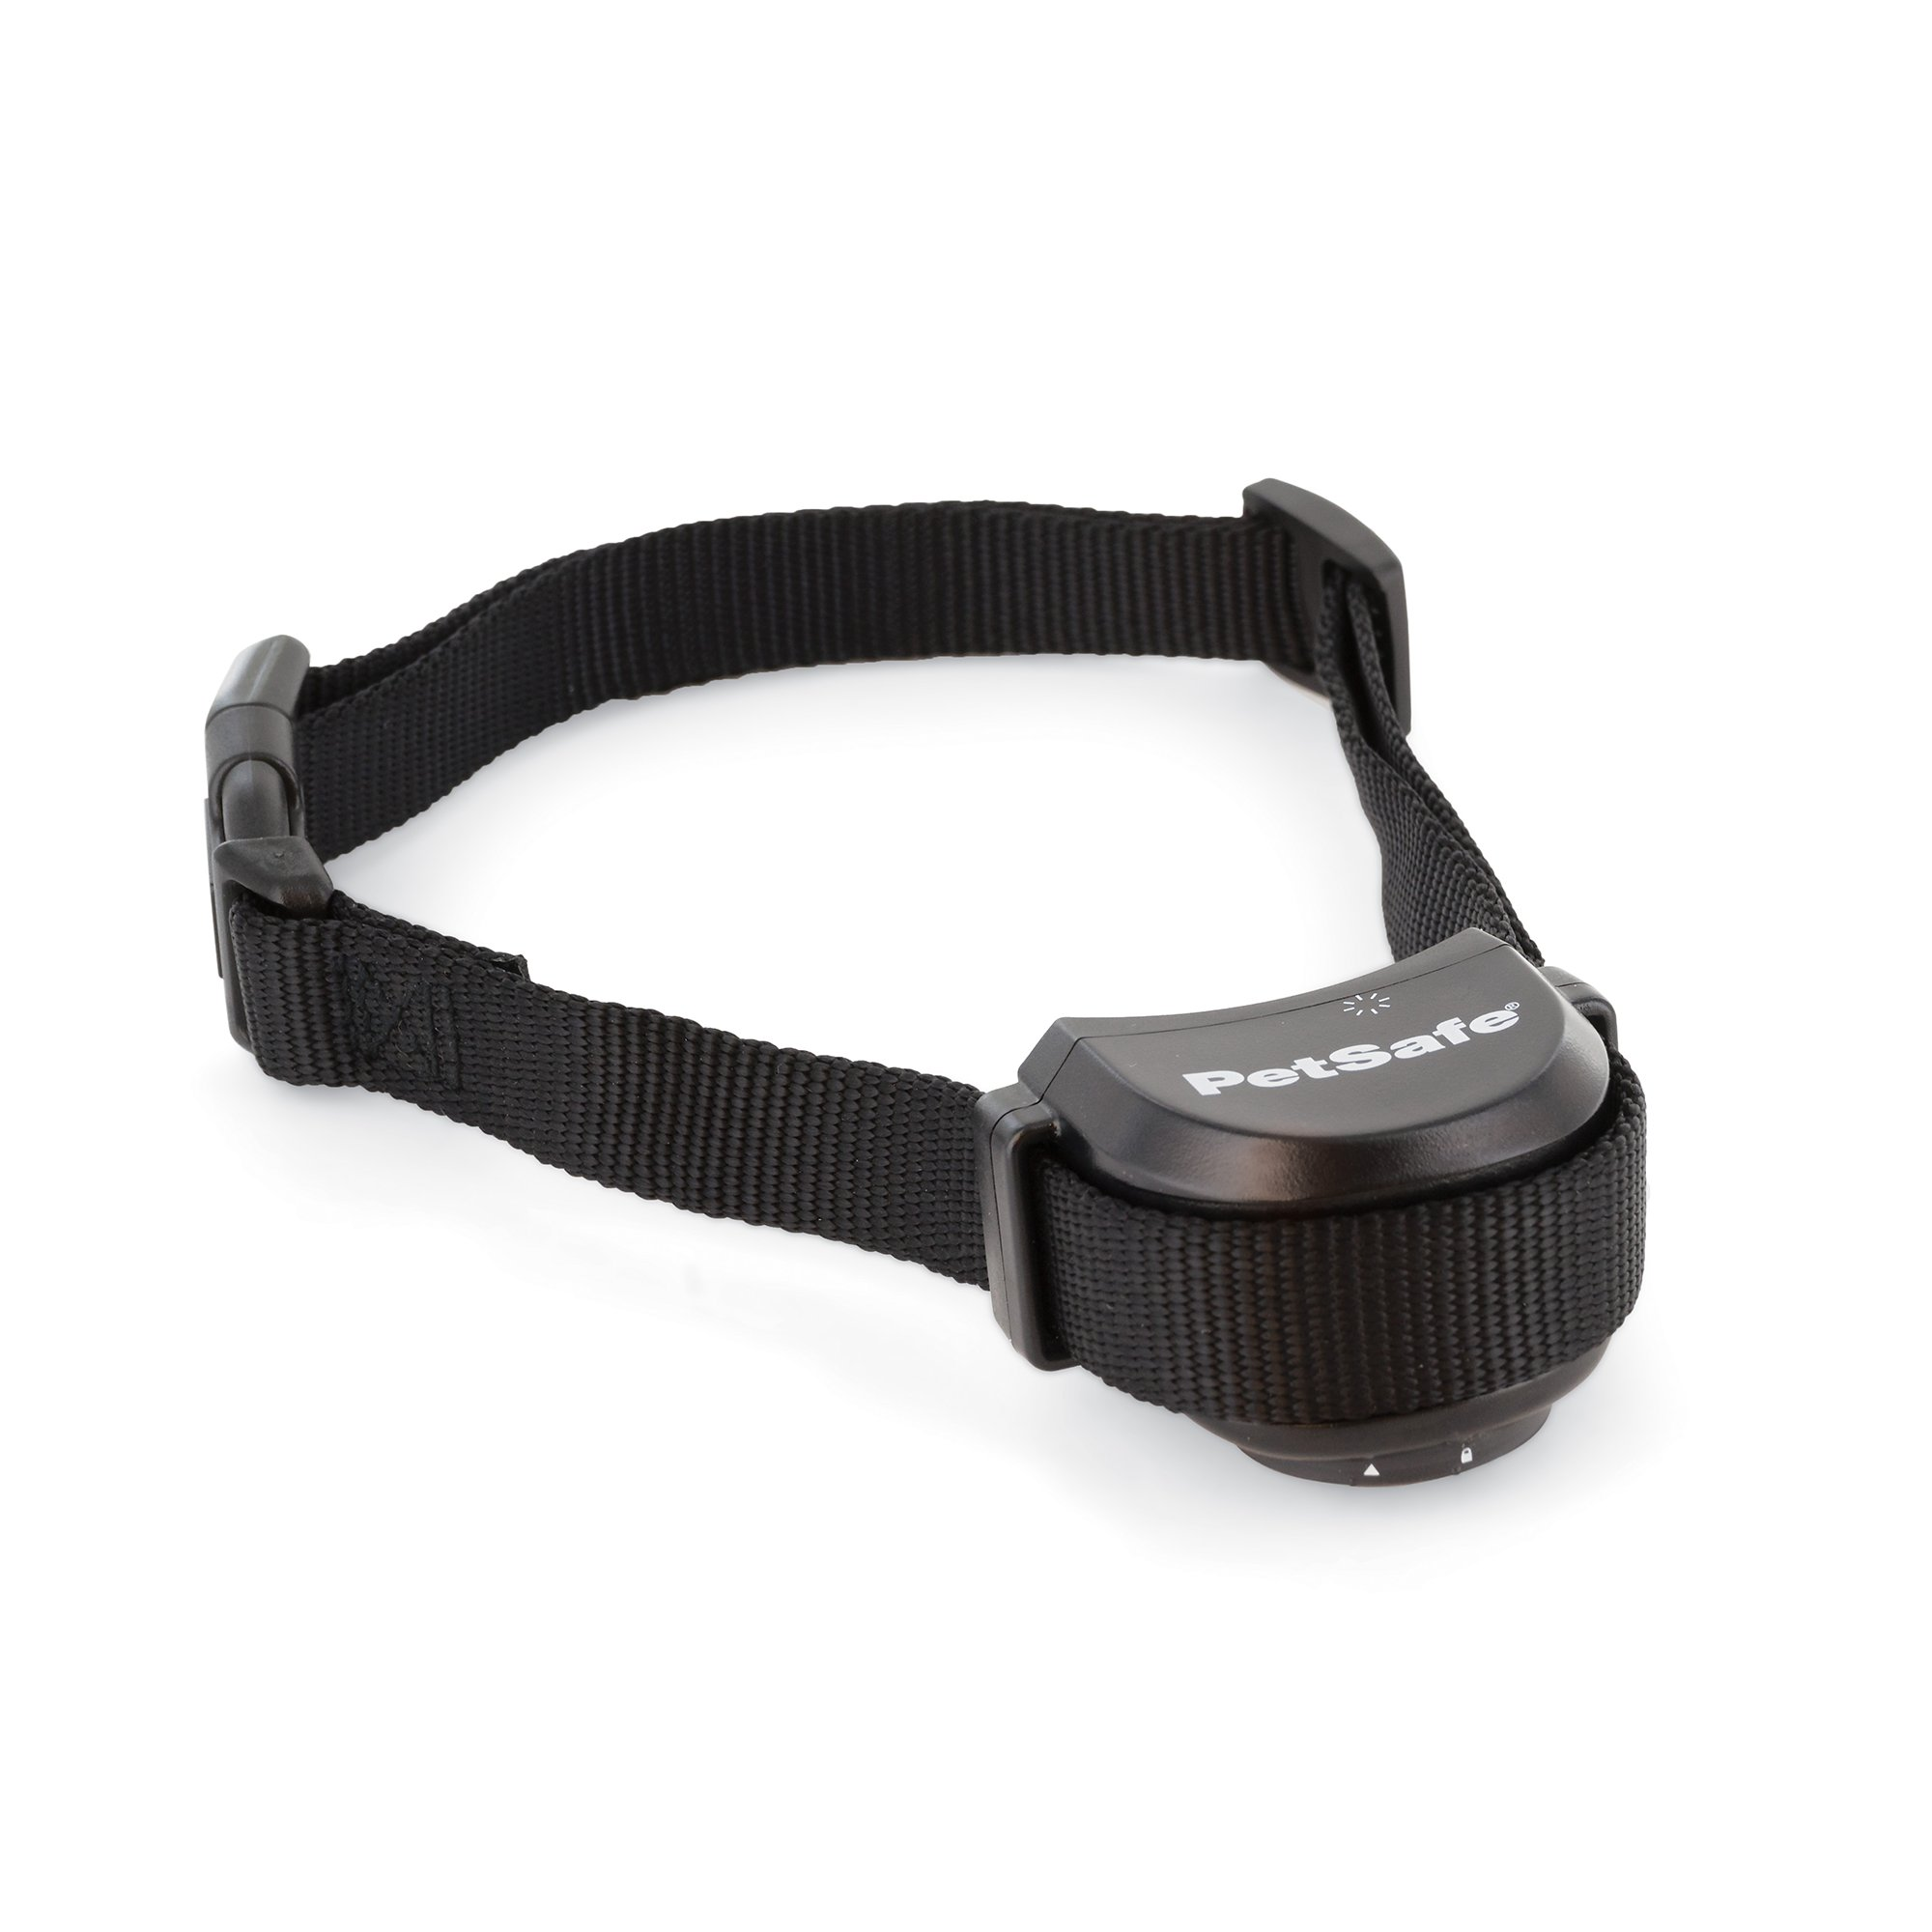 Petsafe Free to Roam Wireless Fence Receiver Collar